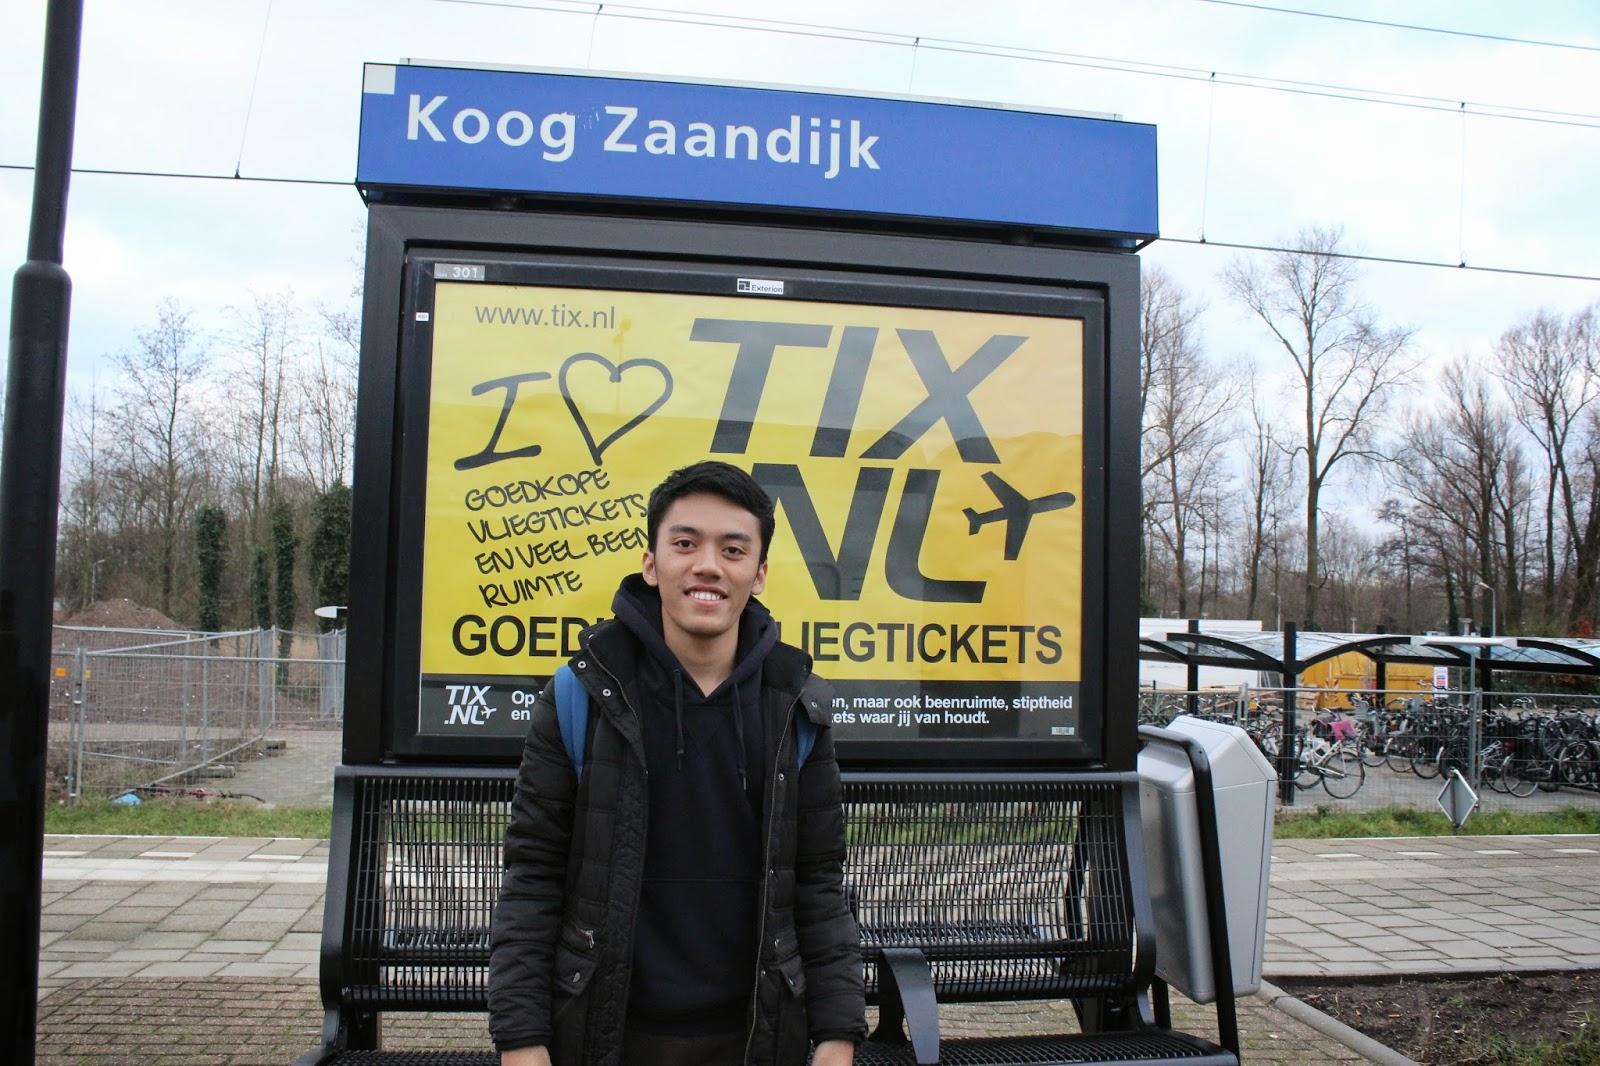 Suasana Stasiun Koog-Zaandijk, Amsterdam, Belanda